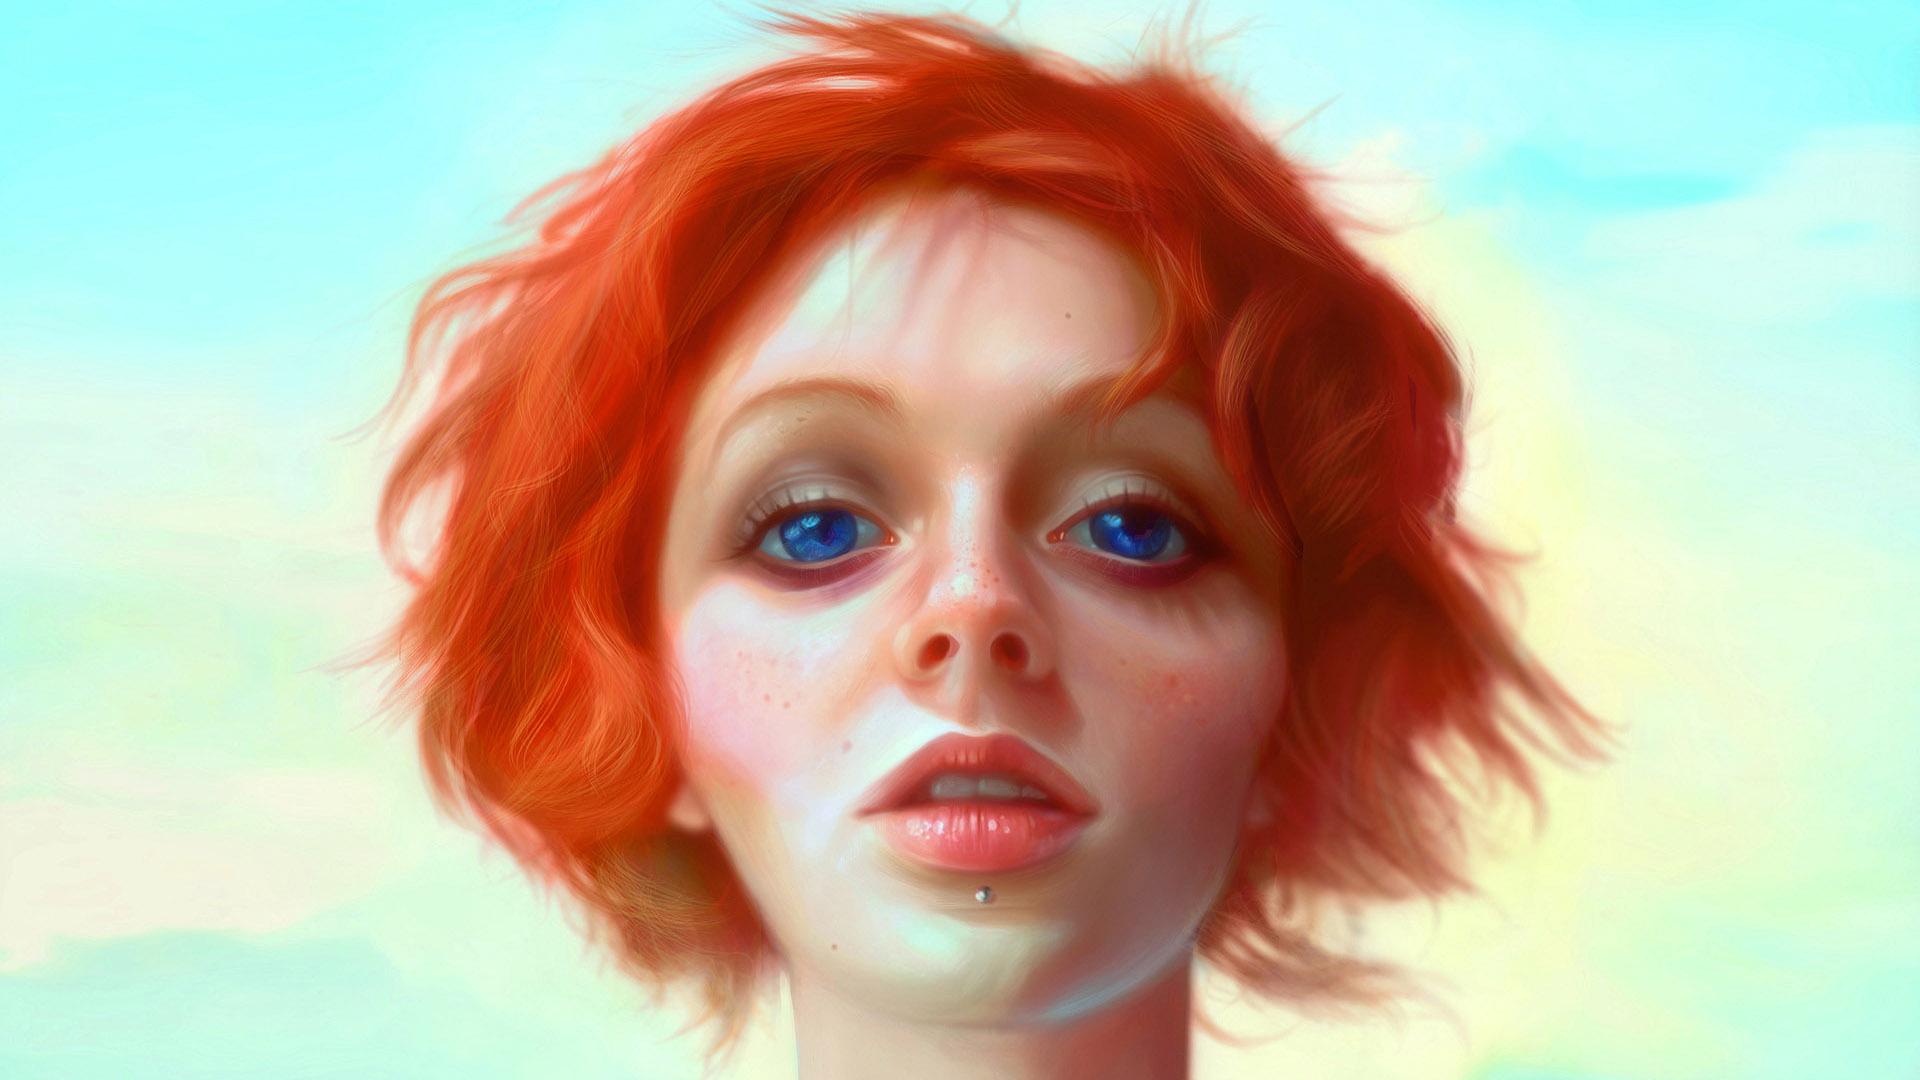 General 1920x1080 painting artwork women redhead blue eyes portrait